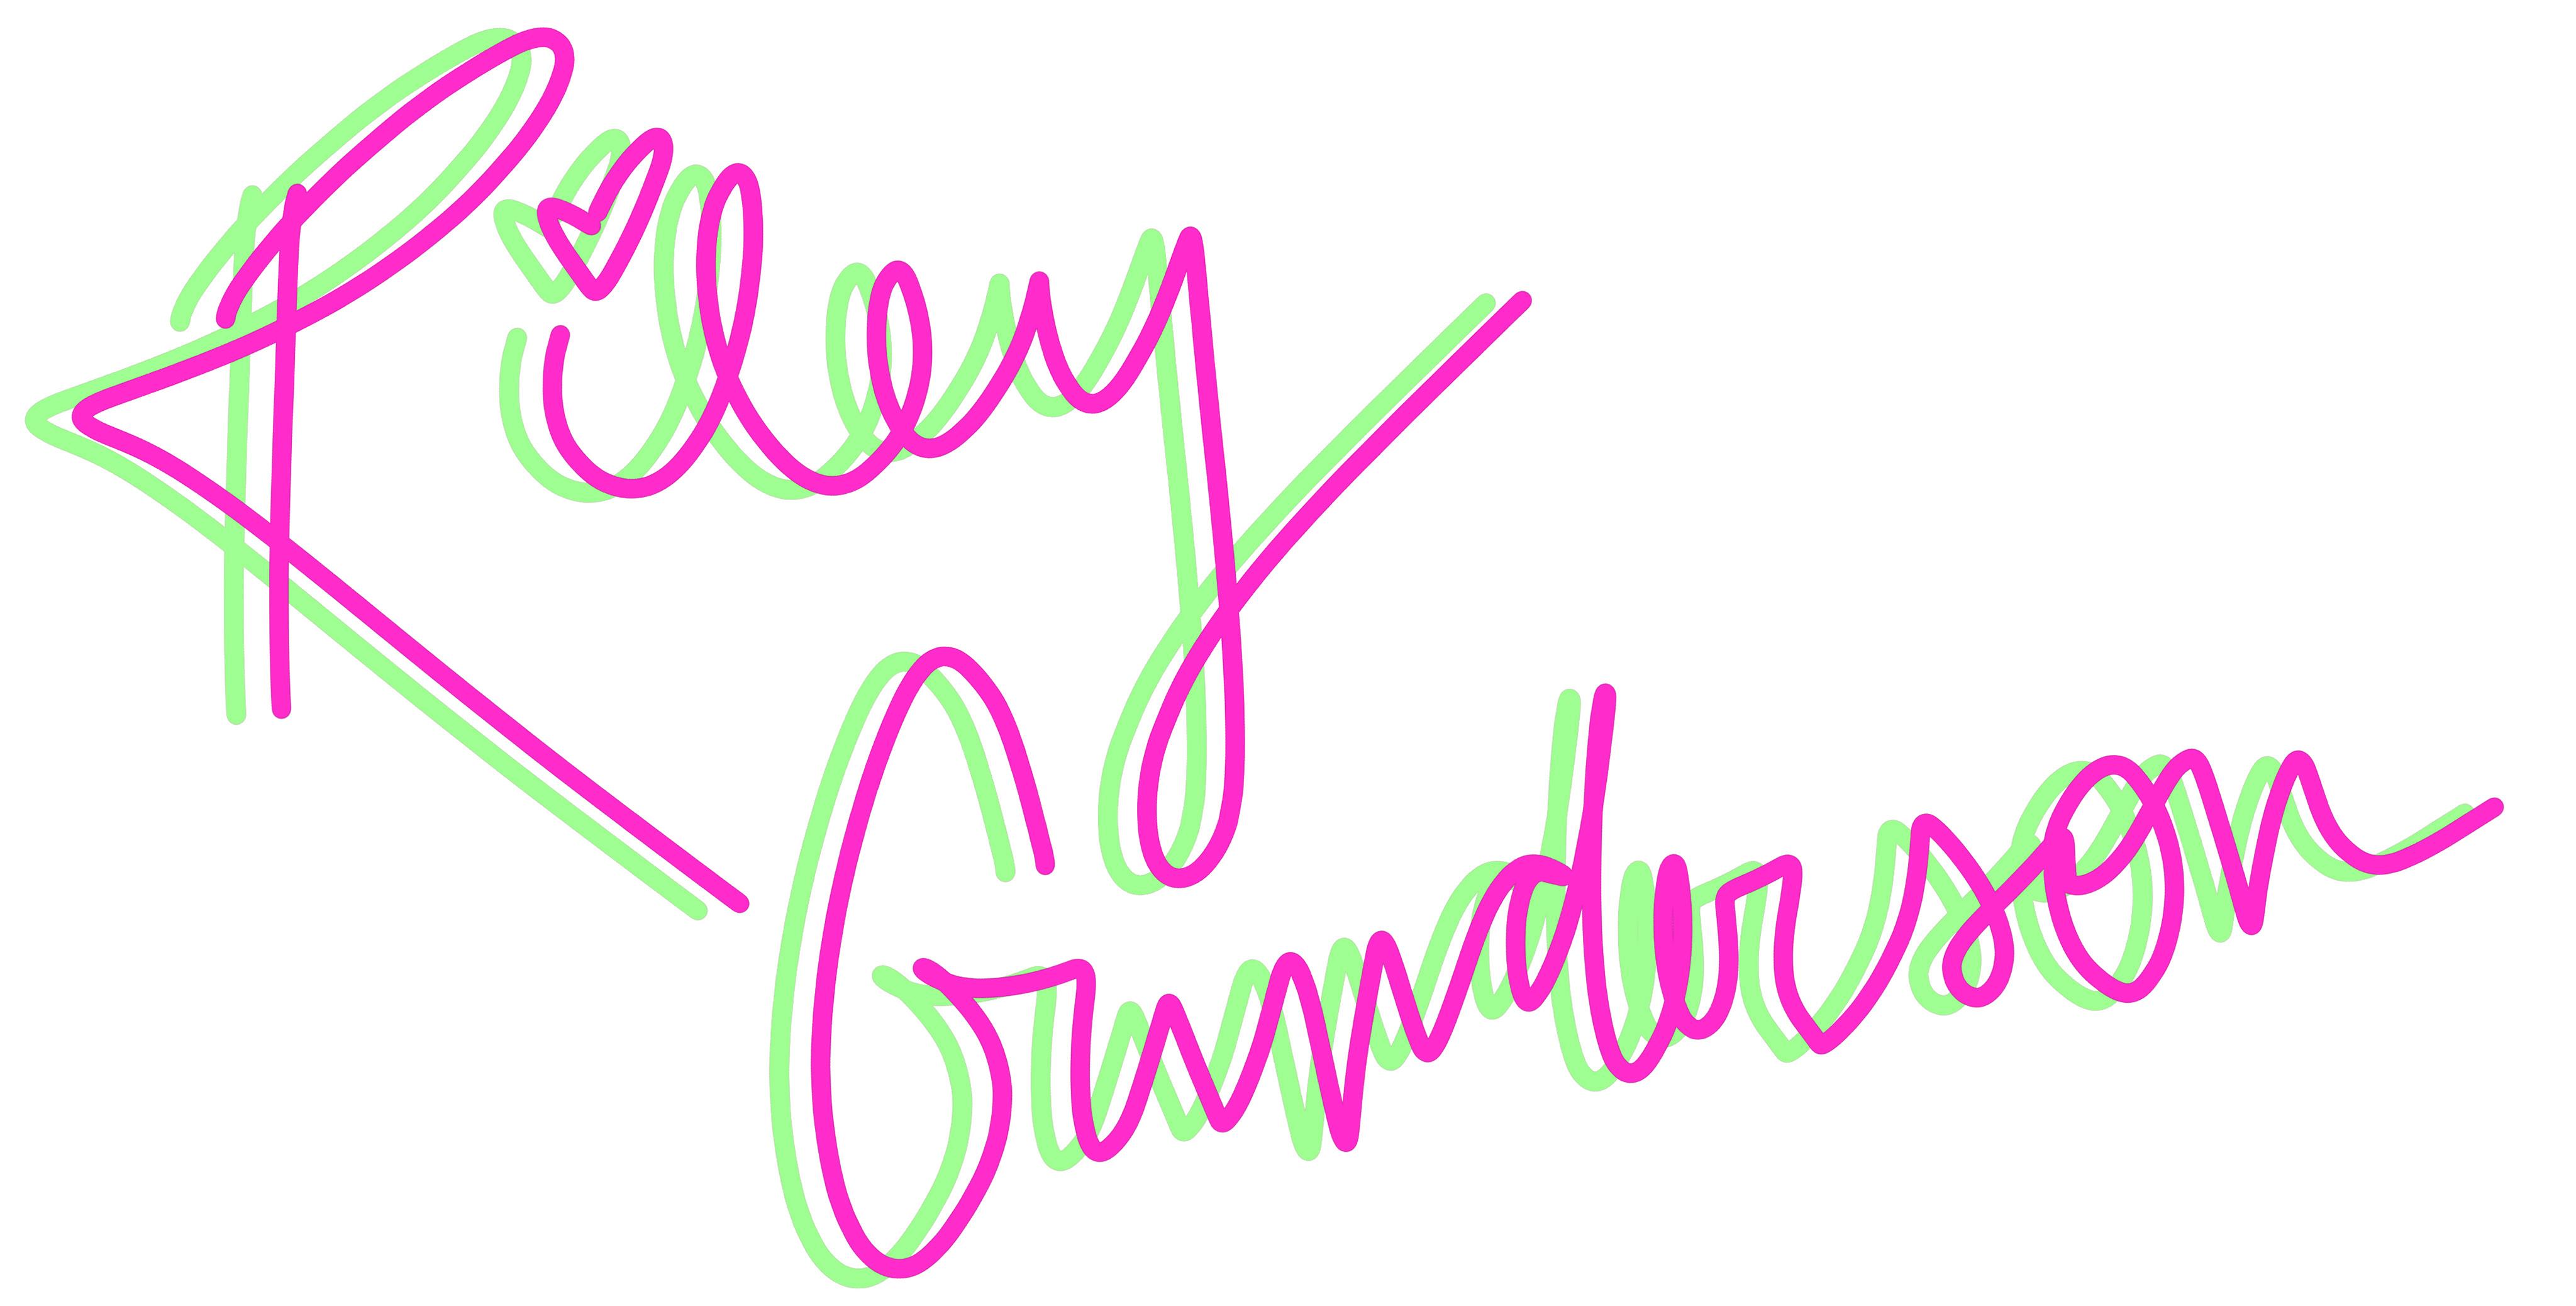 Riley Gunderson